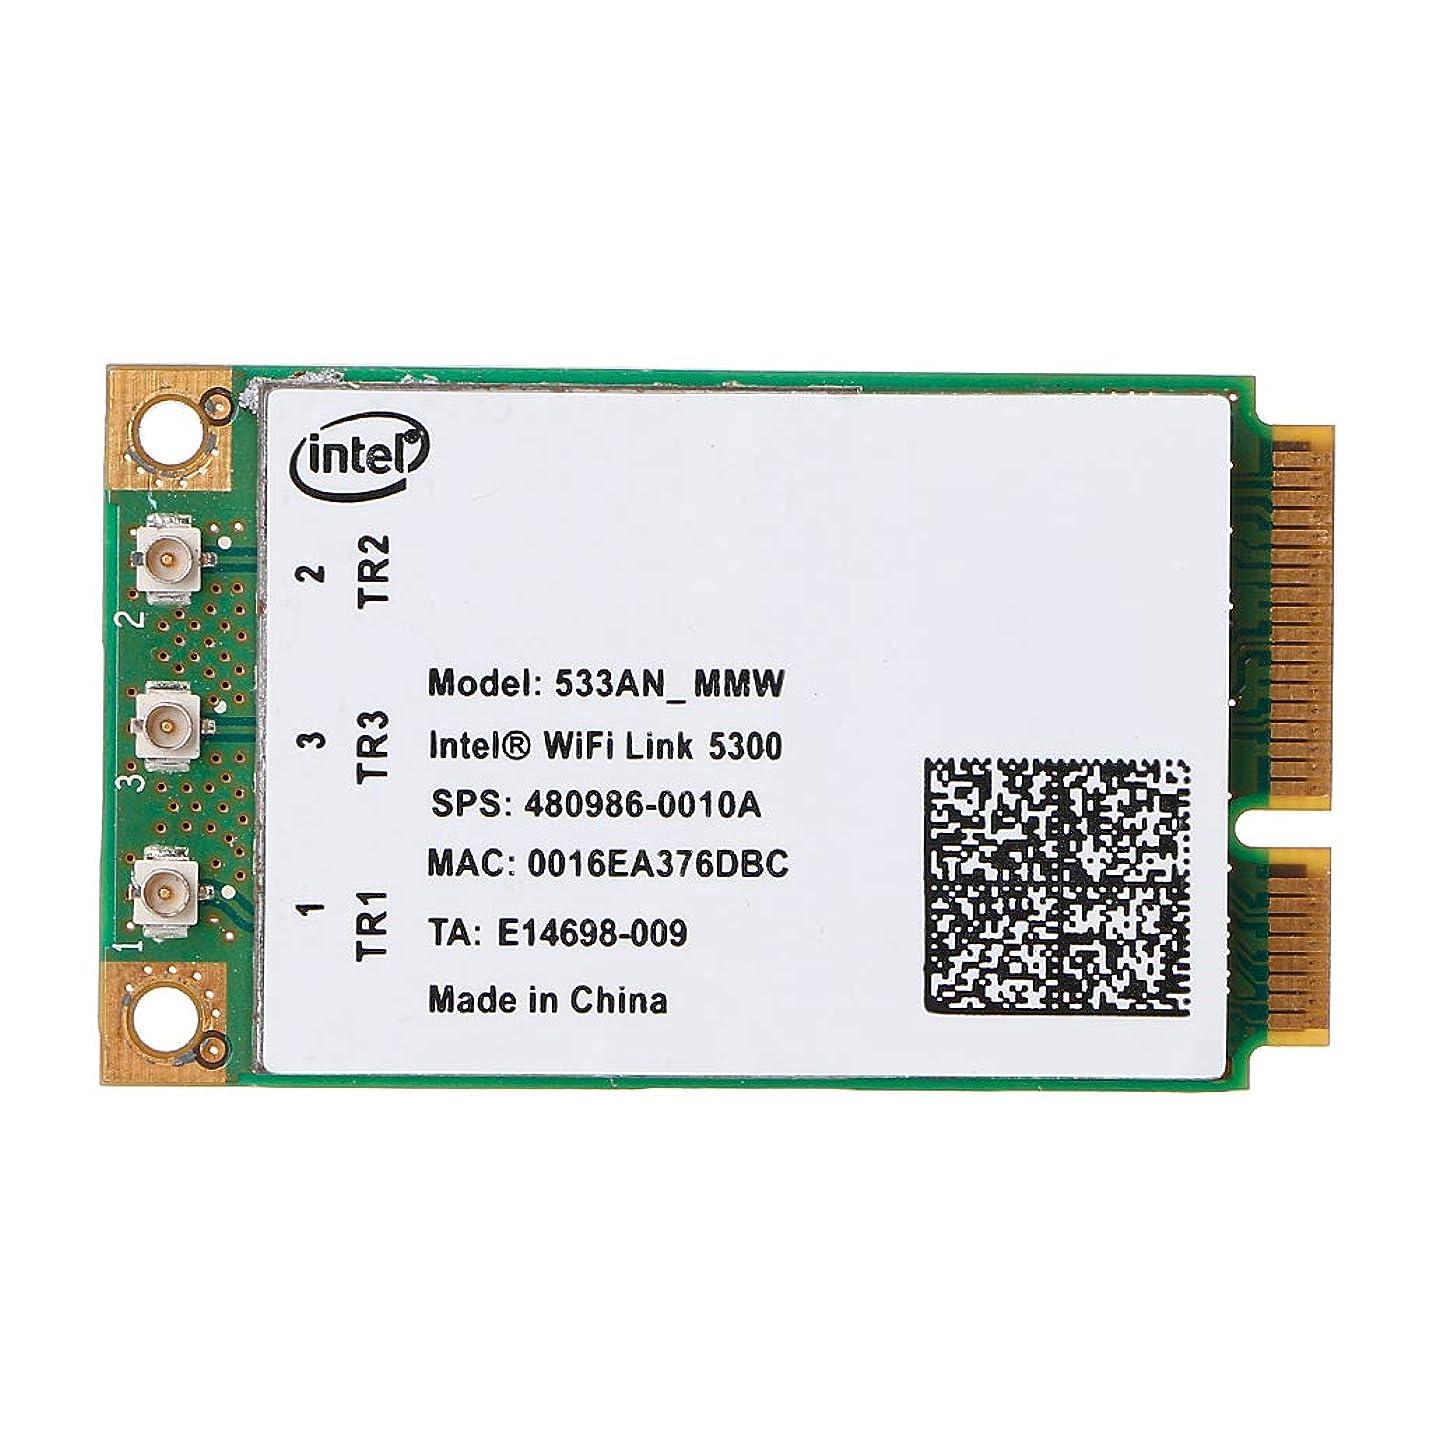 Rabortw 5300 533AN_MMW ワイヤレス WLAN wifi ミニ PCIe カード 802.11 n + 450Mbps デバイスモジュール